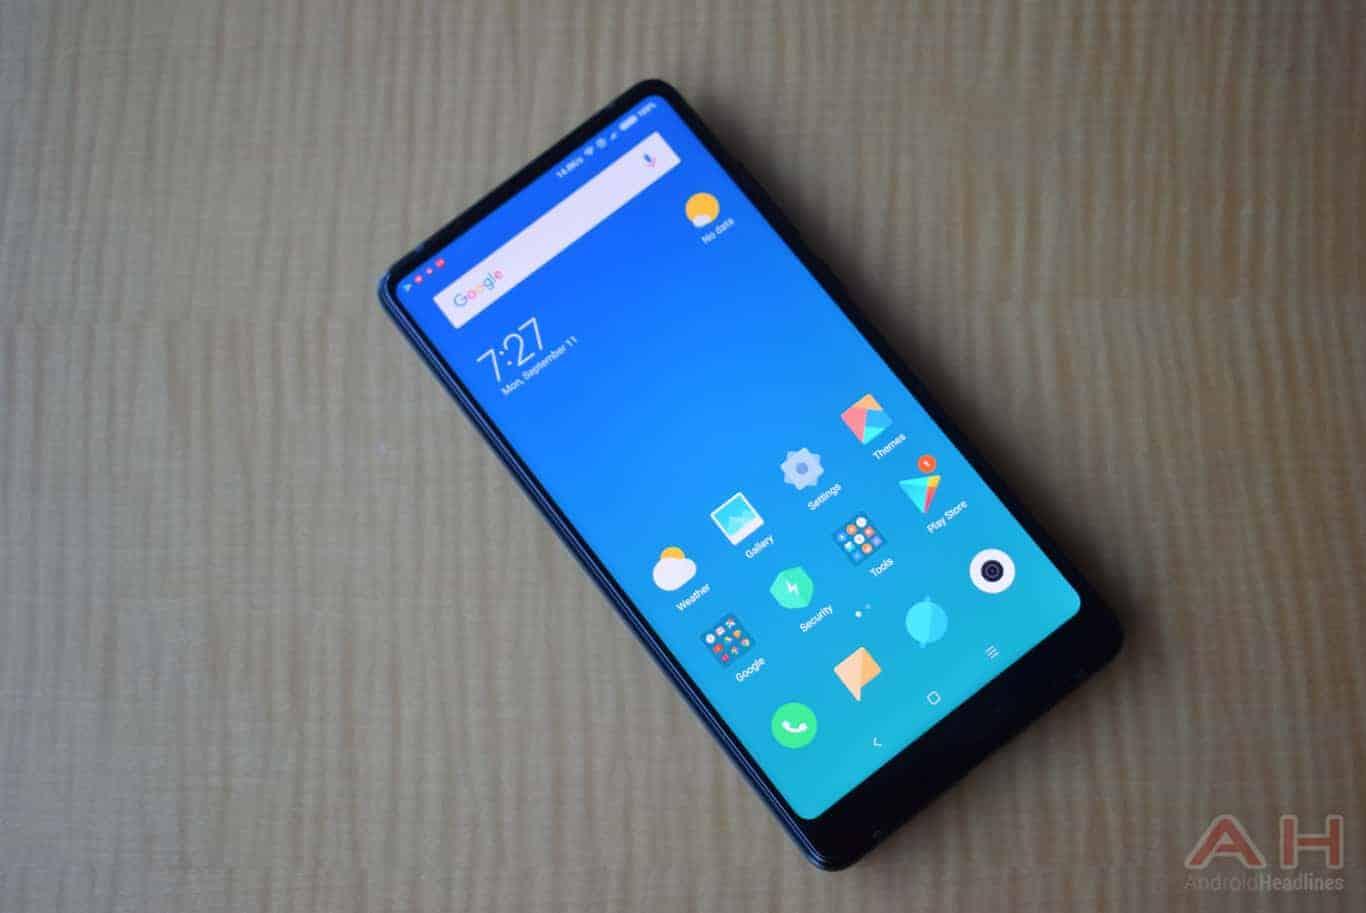 Xiaomi Mi MIX 2 Hands On AM AH 4